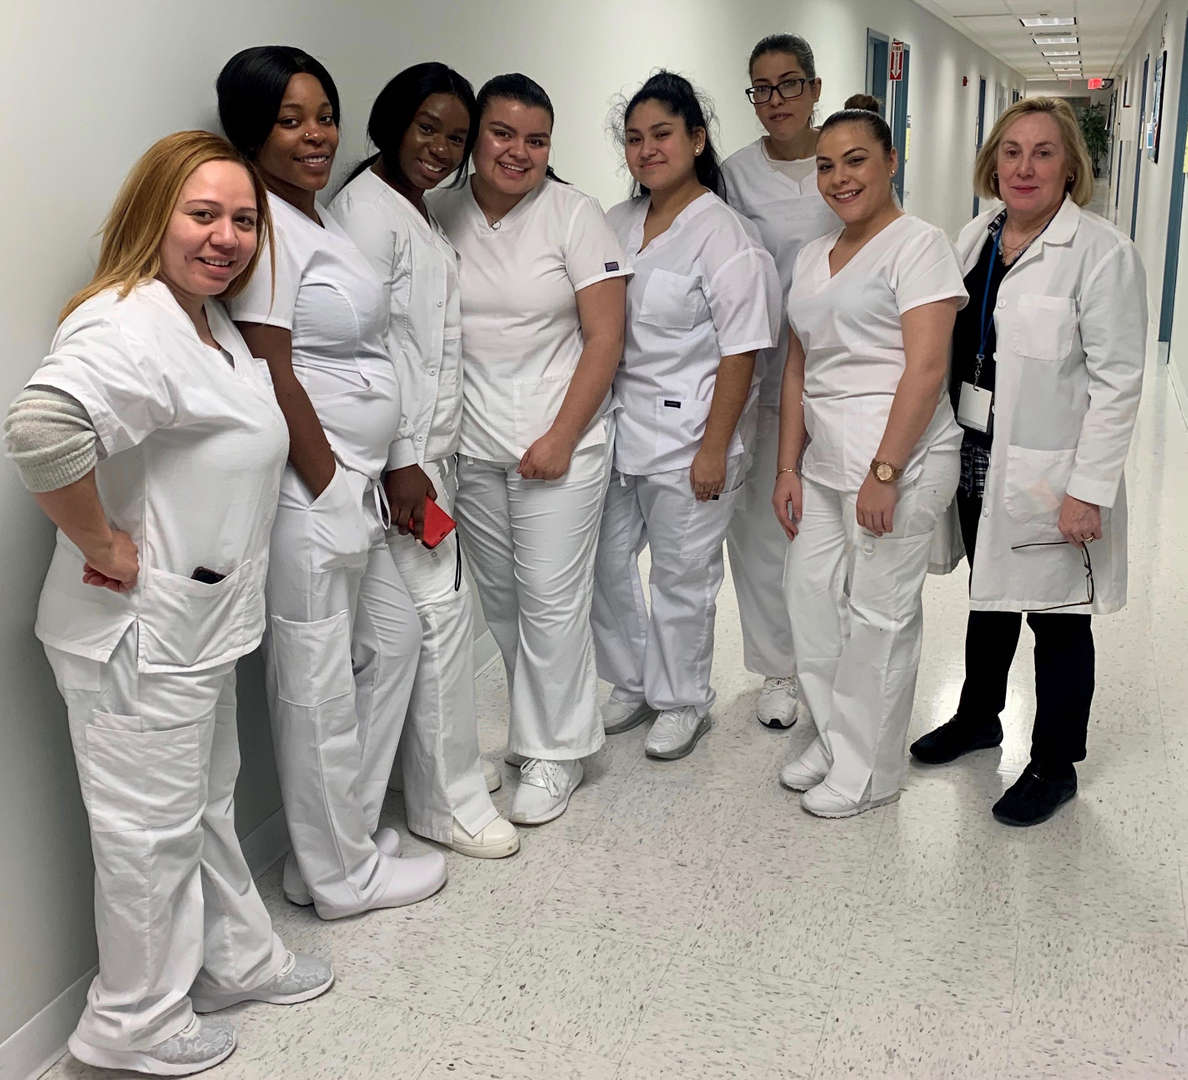 Image of Adult Nursing Students